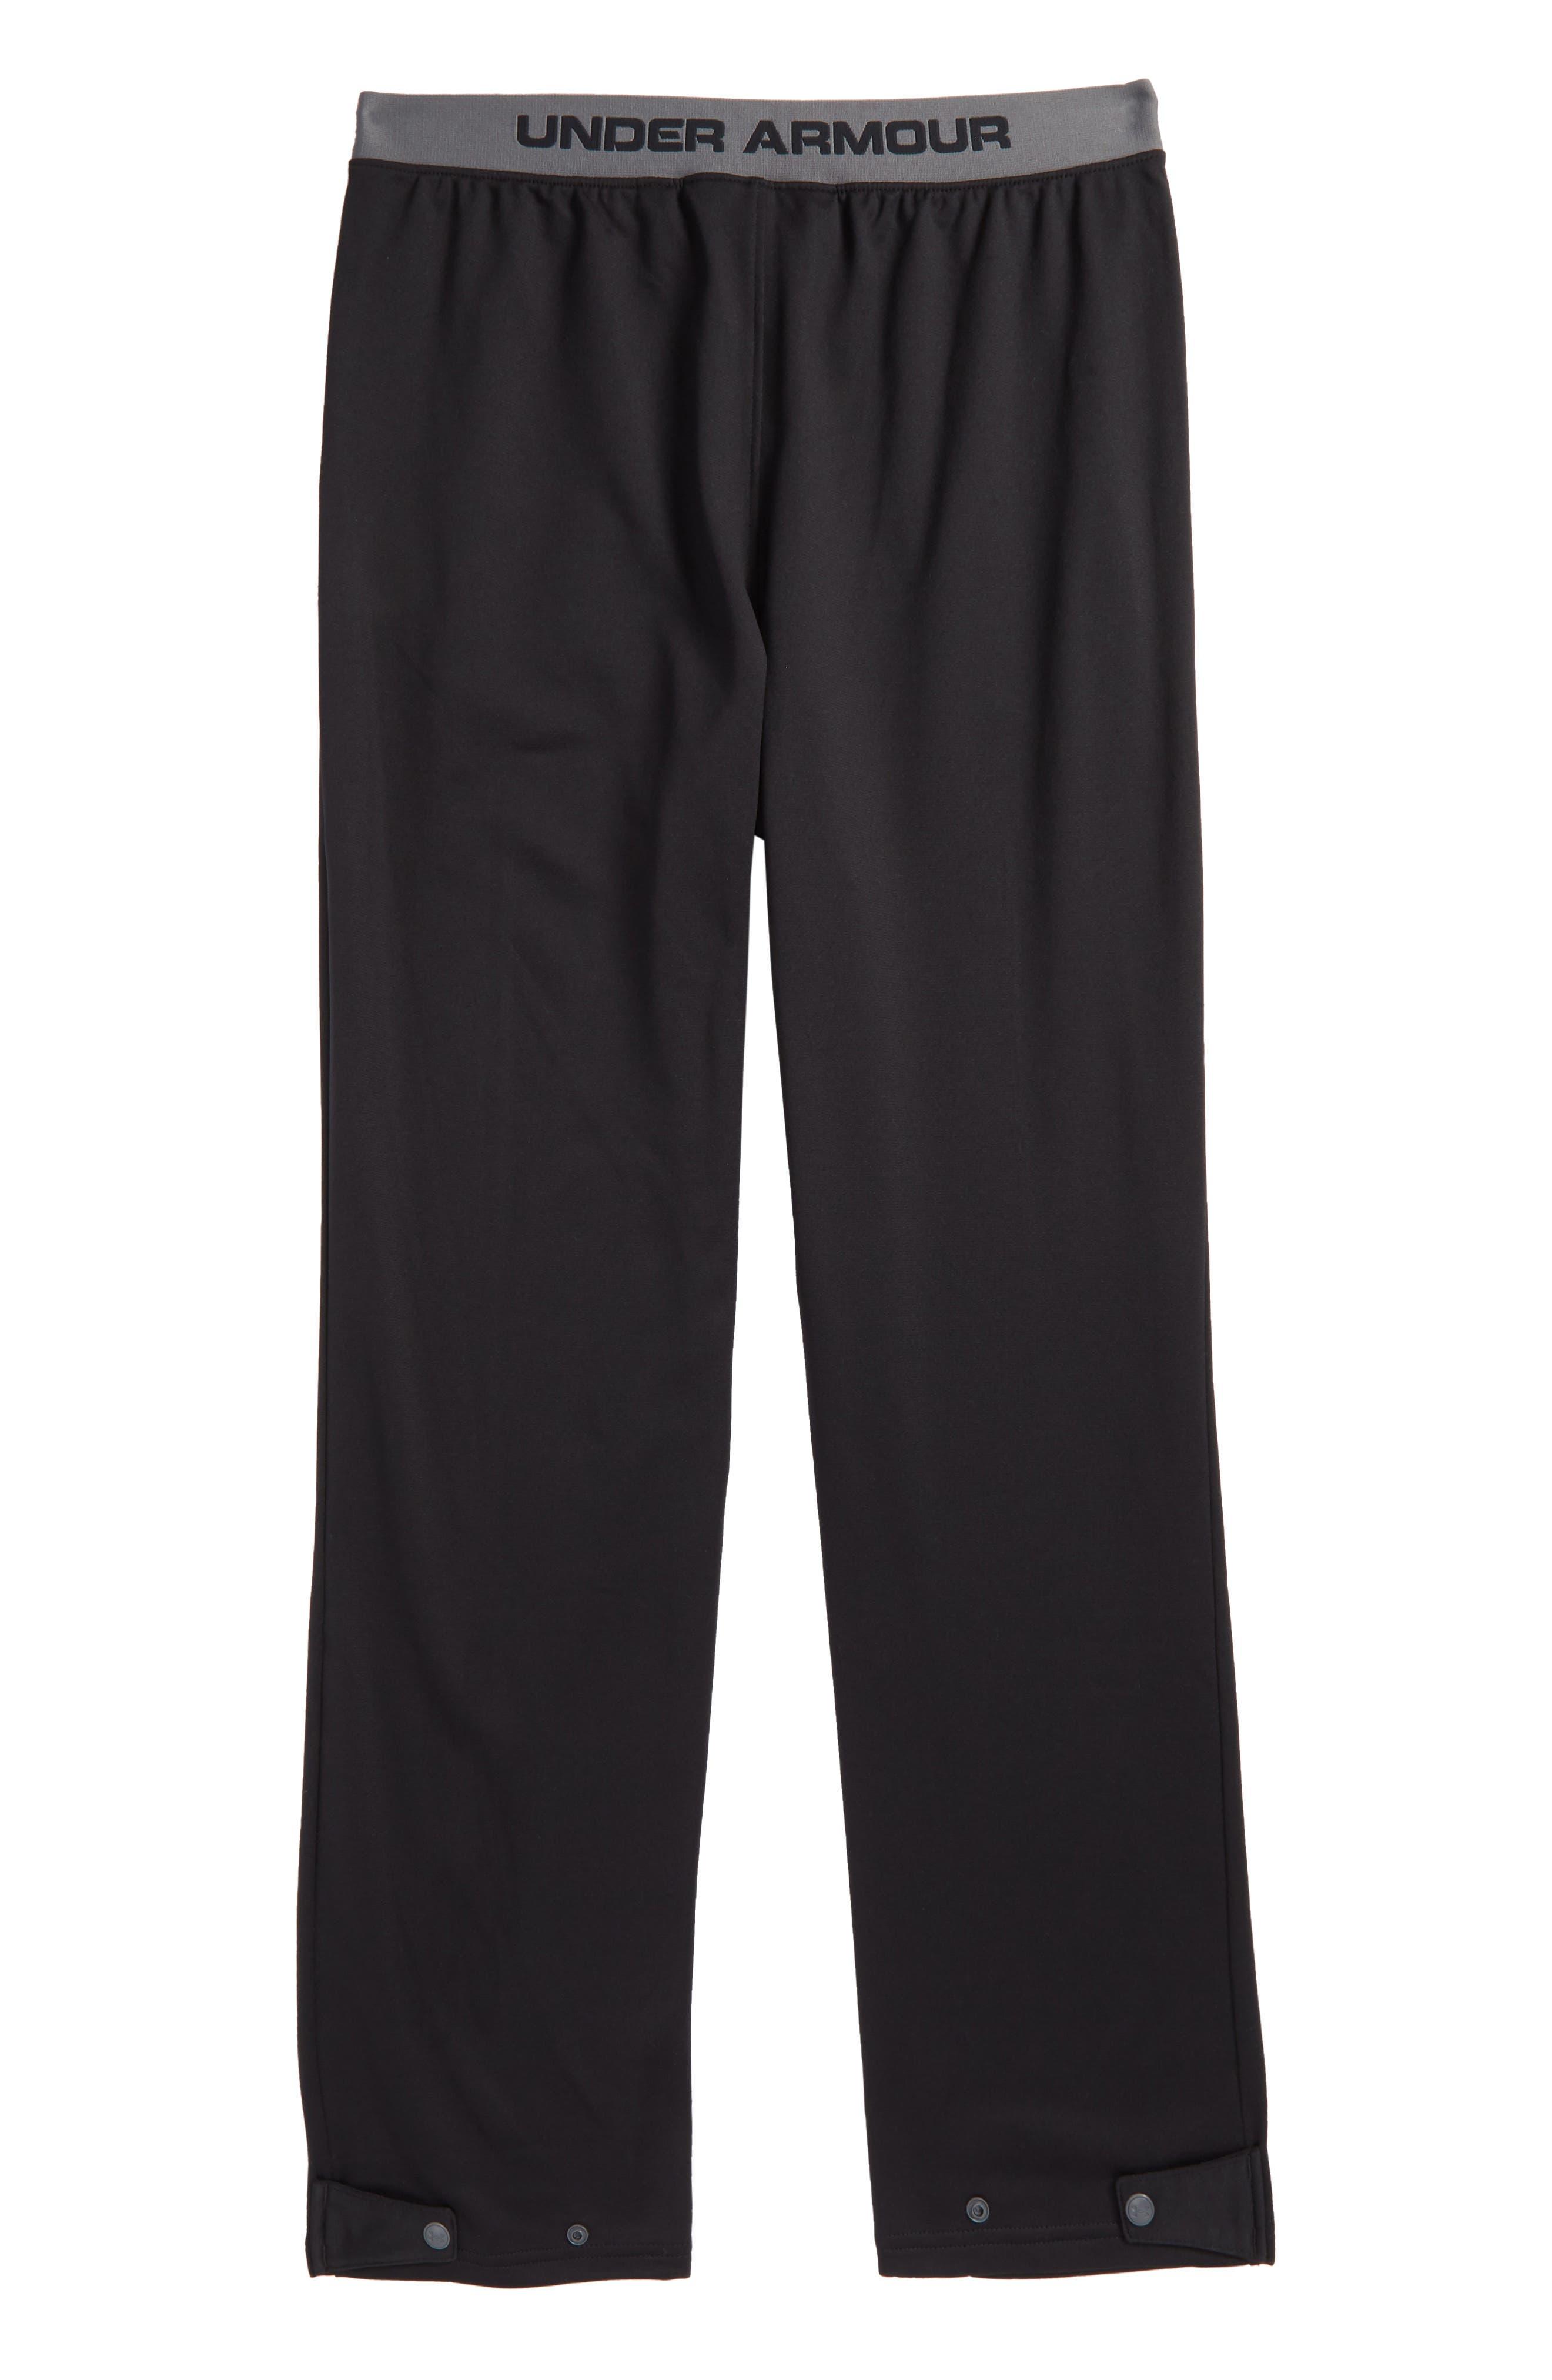 UNDER ARMOUR,                             Brawler Slim Sweatpants,                             Alternate thumbnail 2, color,                             001